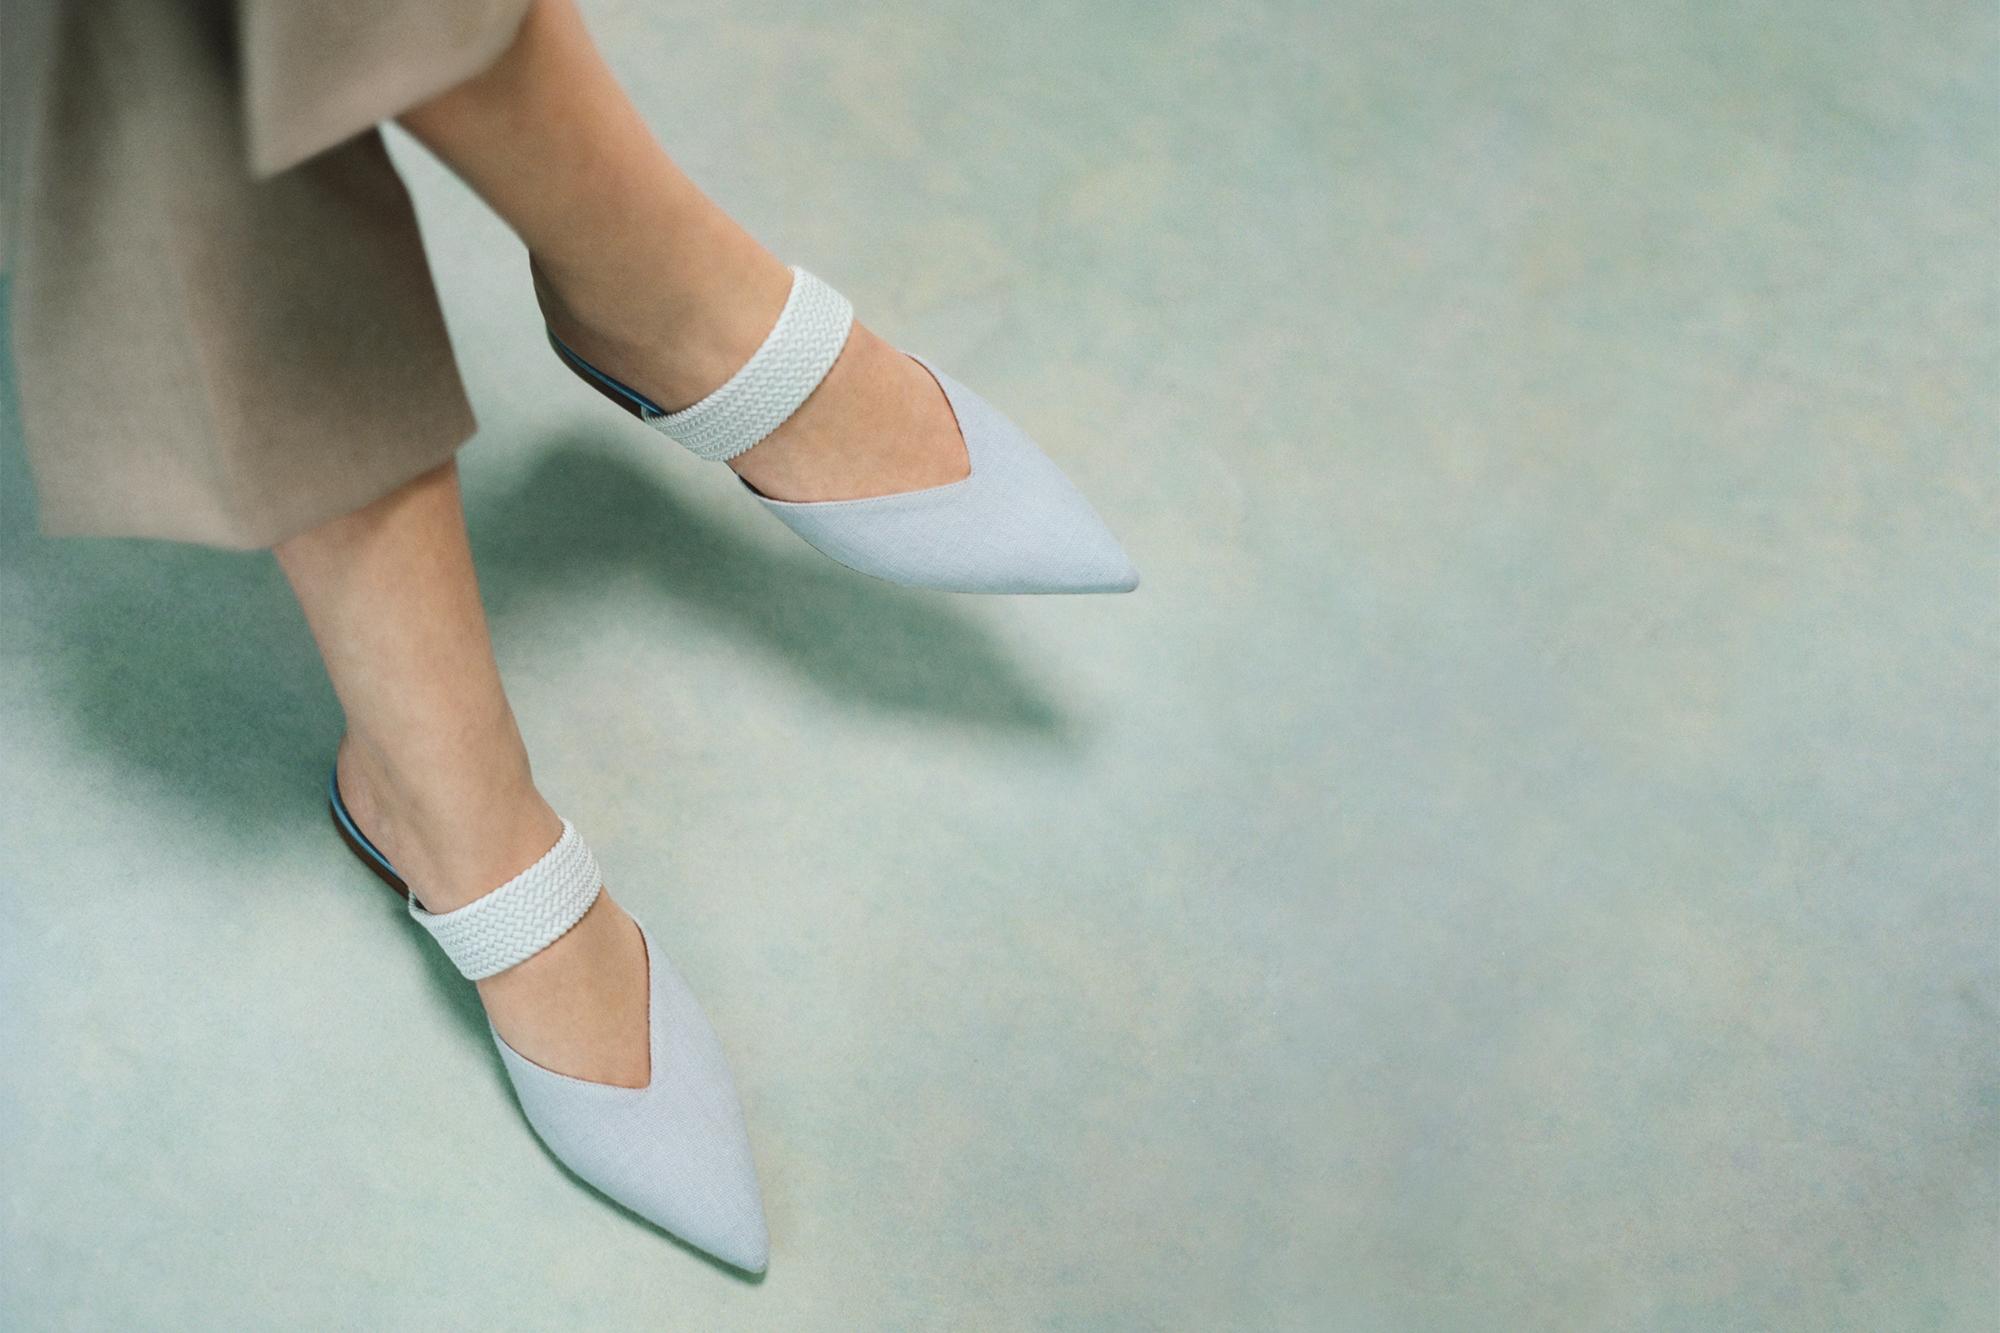 Women's Zero Waste Shoes Conscious Shoe Design by Malone Souliers